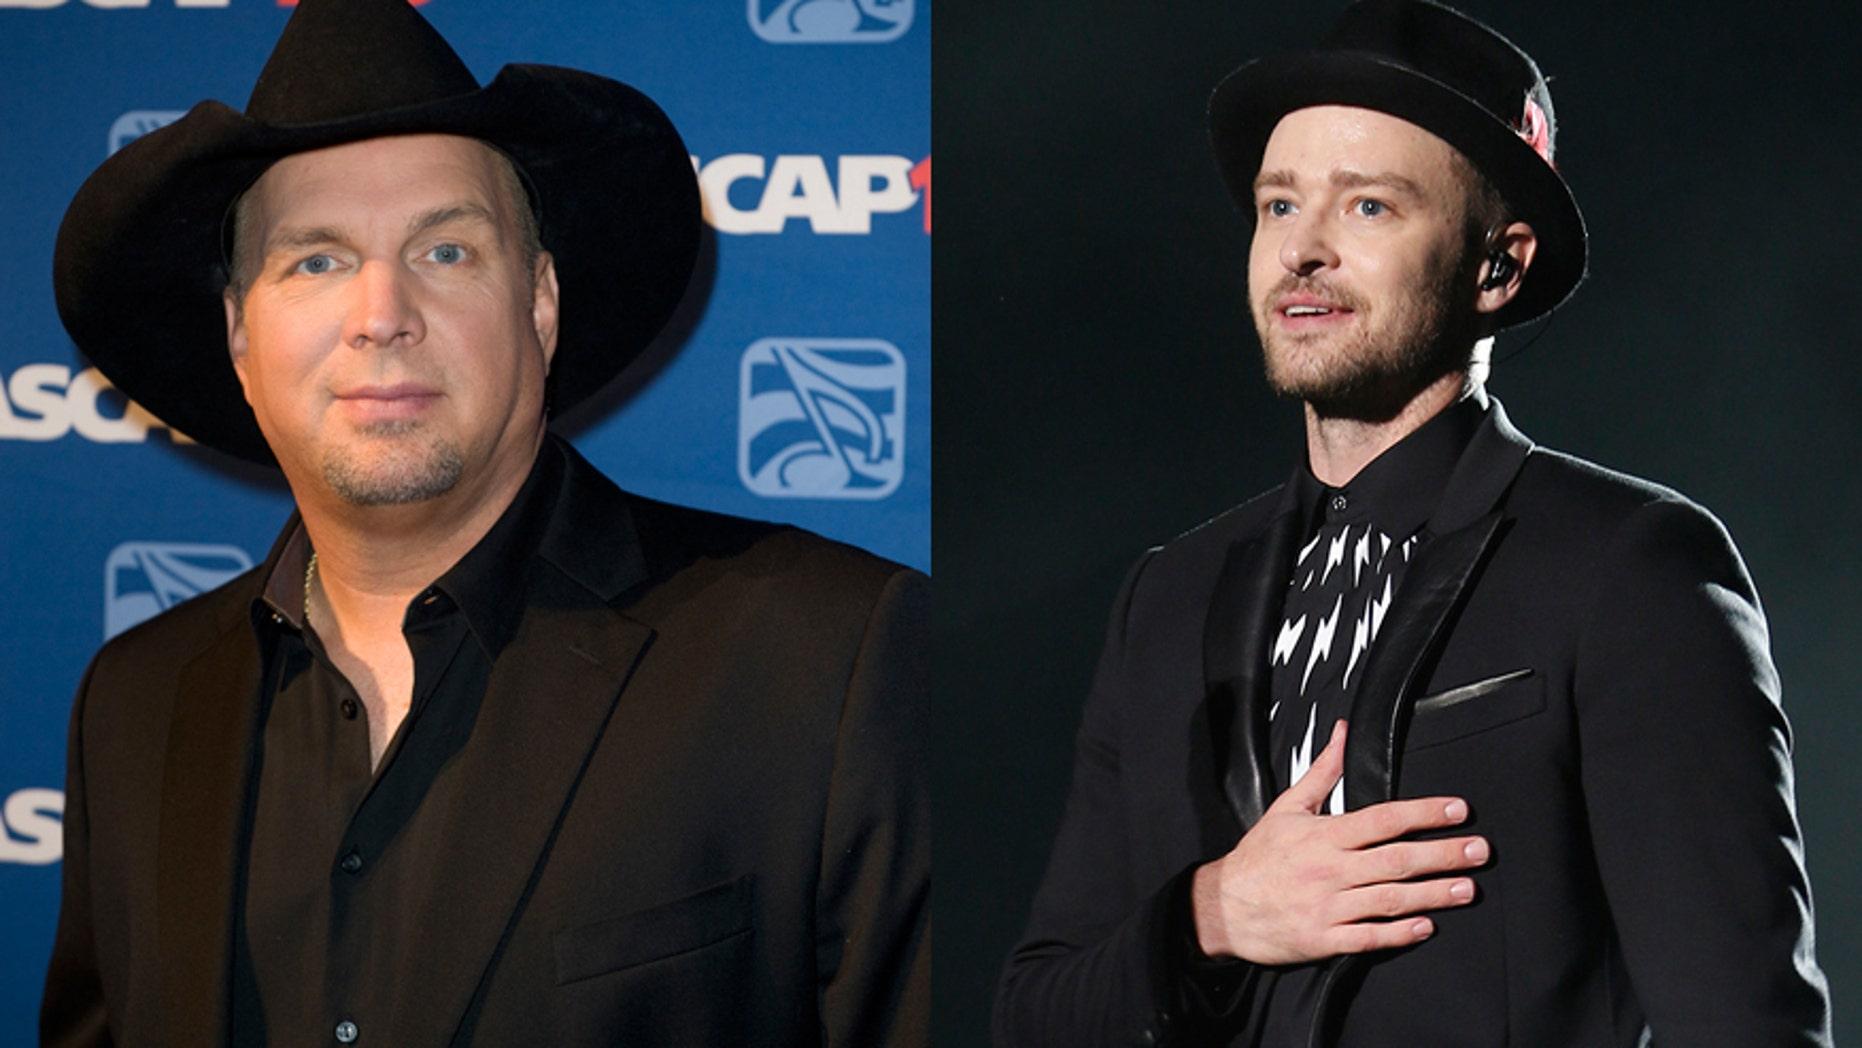 Singers Garth Brooks (L) and Justin Timberlake.